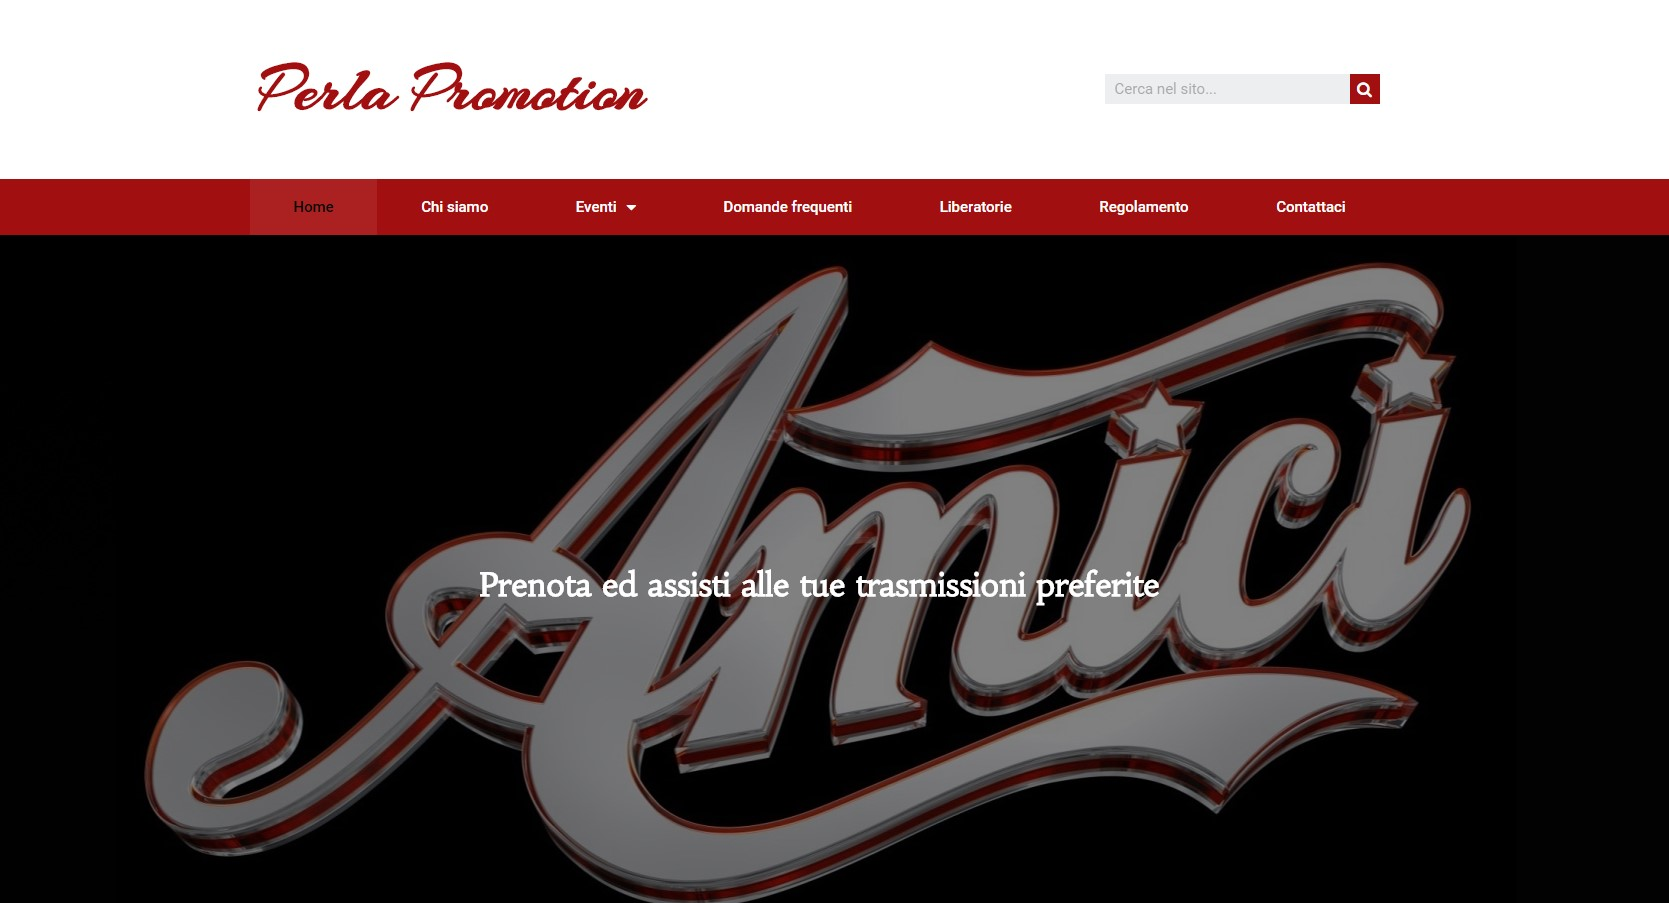 Perla Promotion 2020